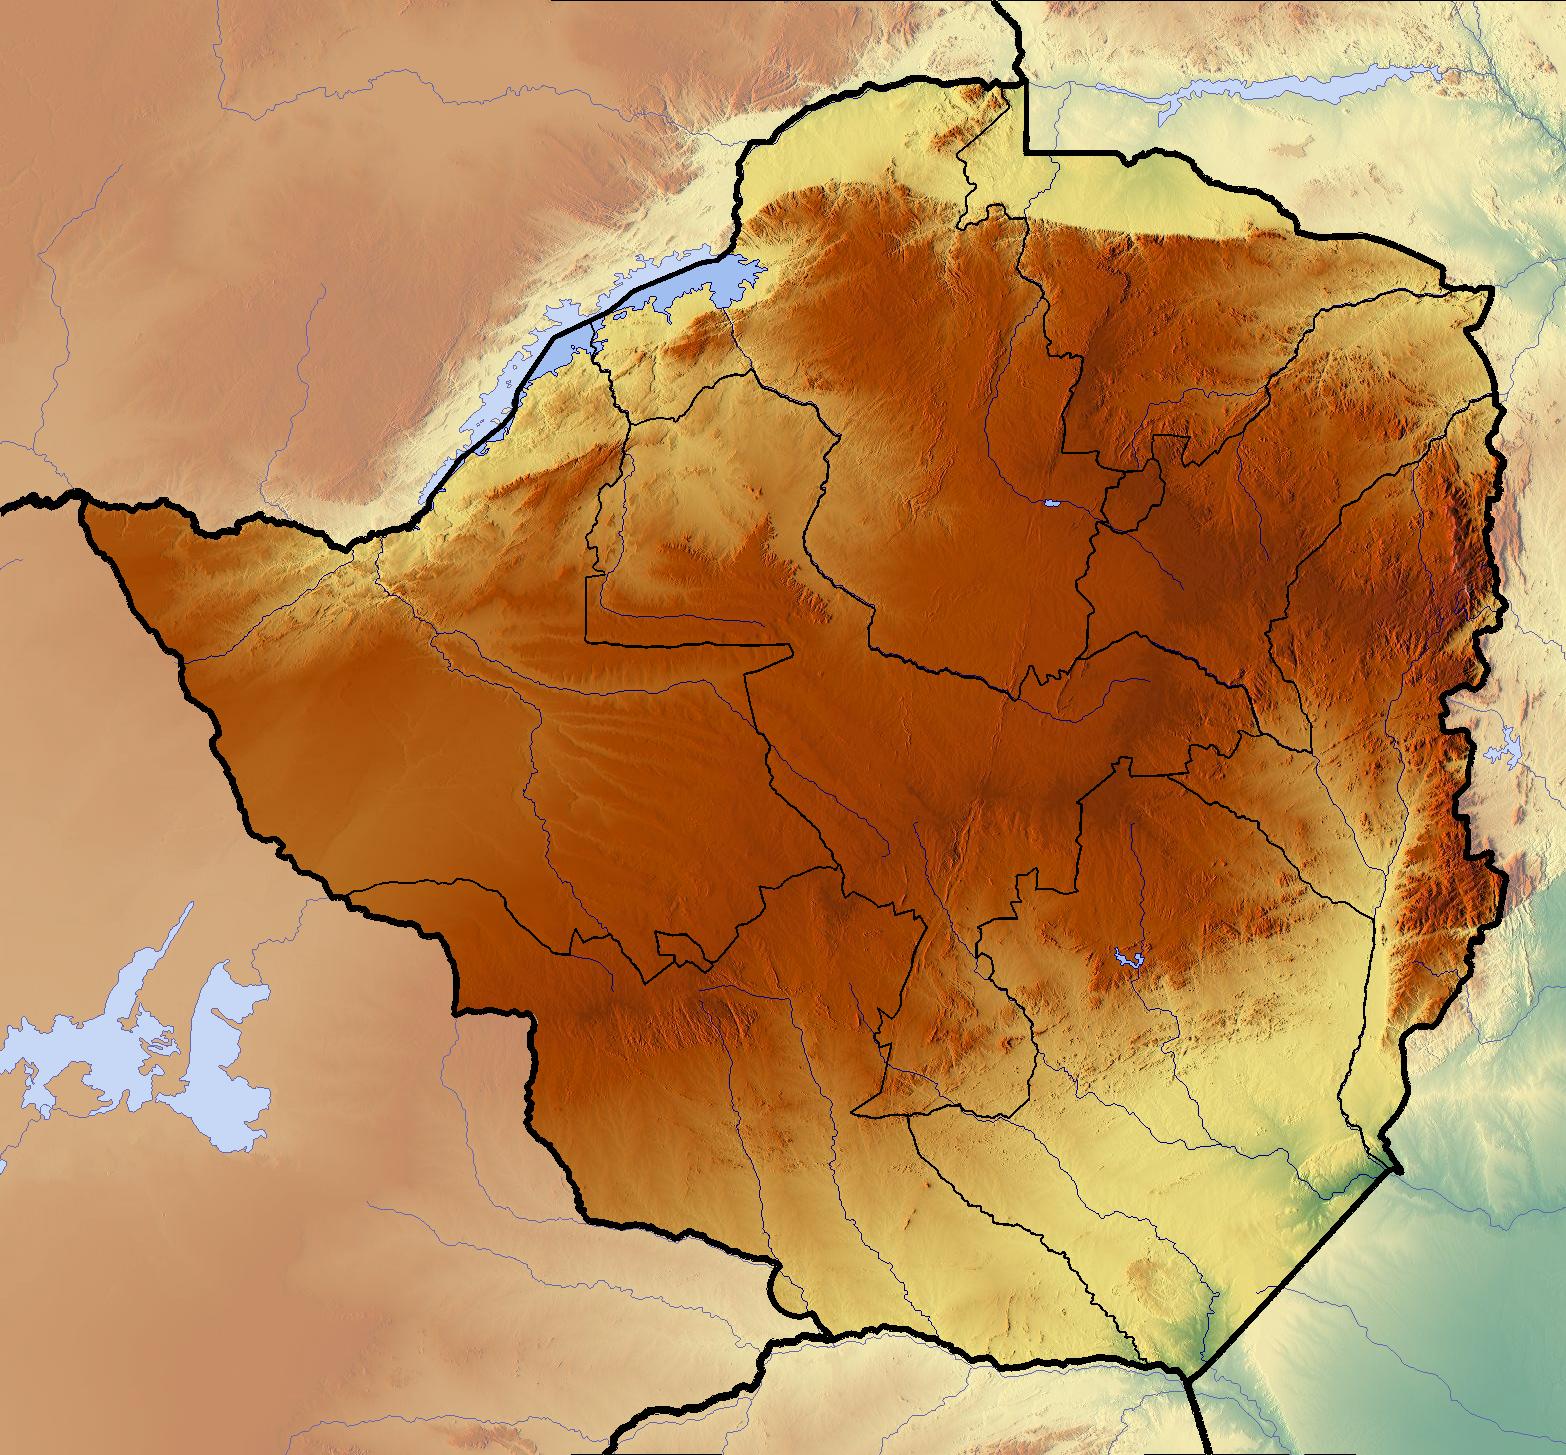 Topographic Map Zimbabwe.Zimbabwe Topographic Map Maps Artwork Topographic Map